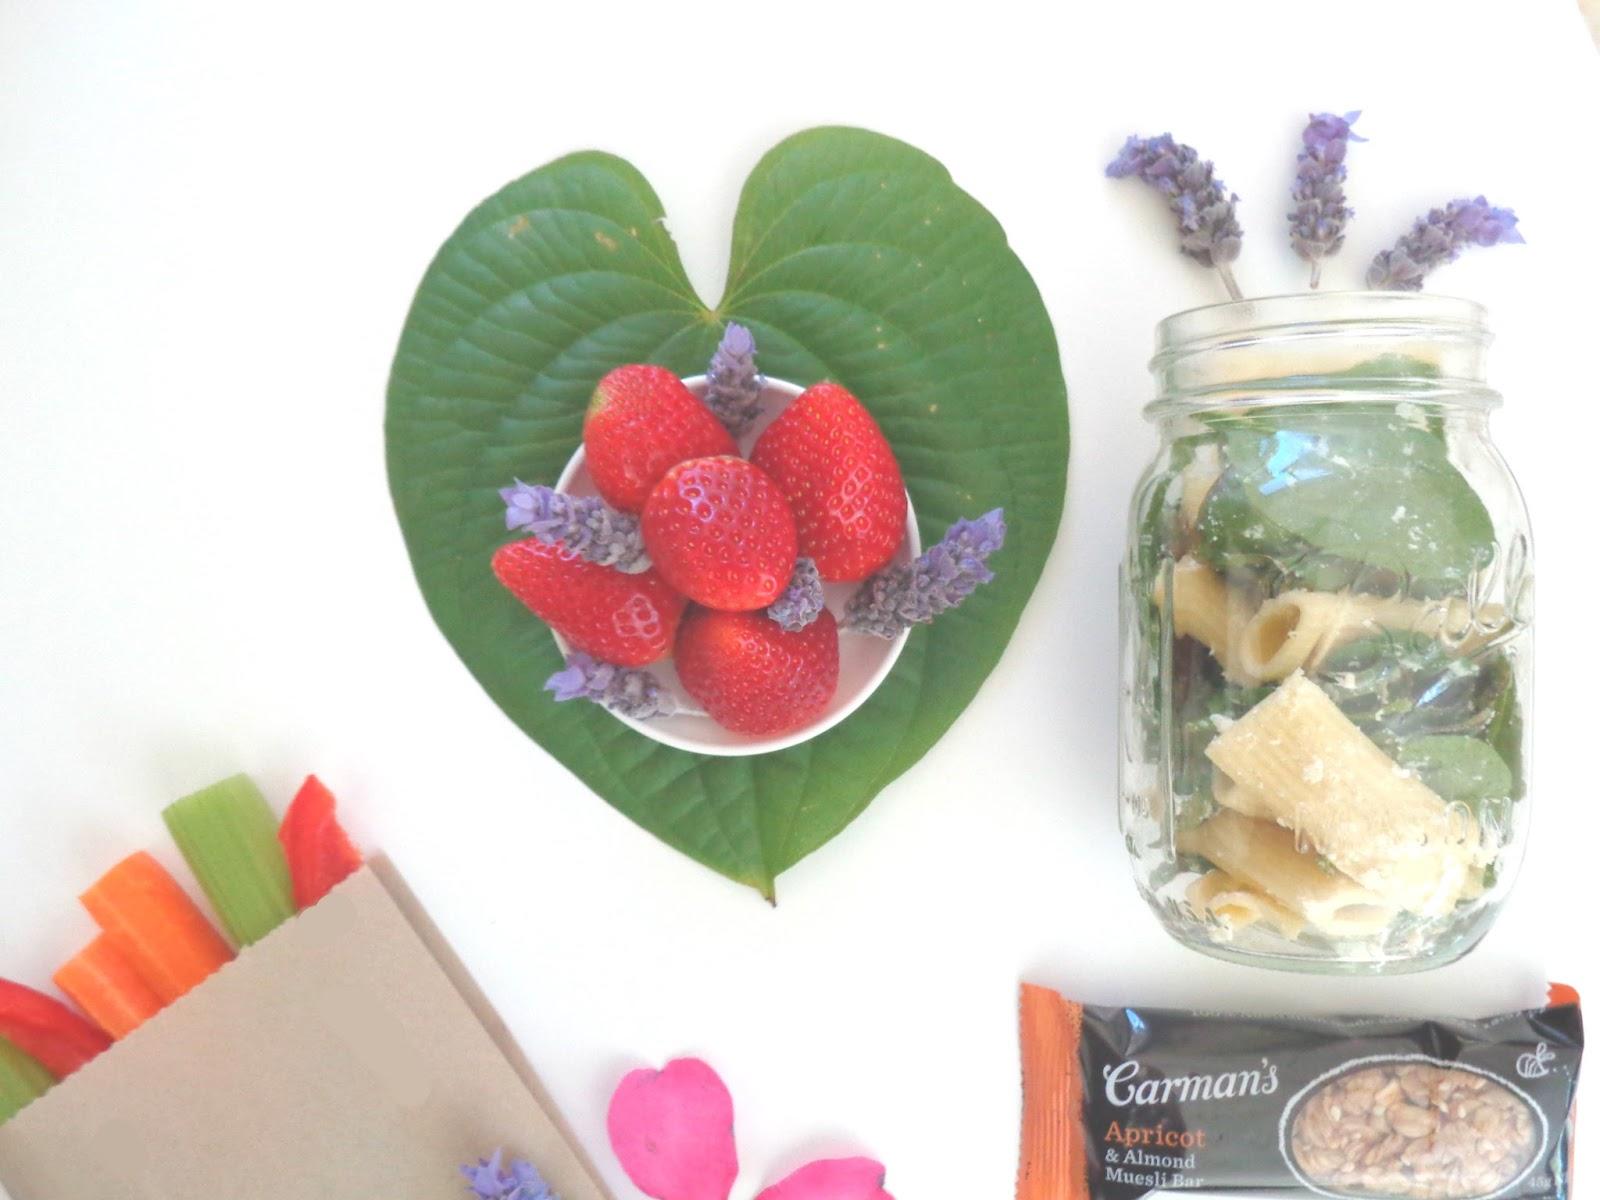 milkywayblog, milkywayblogger, milky way blog, milky way blogger, mwb, georgia, abbott, emilyjaneblog, emily jane, emily jane blog, school, lunch ideas, food, healthy, snacks